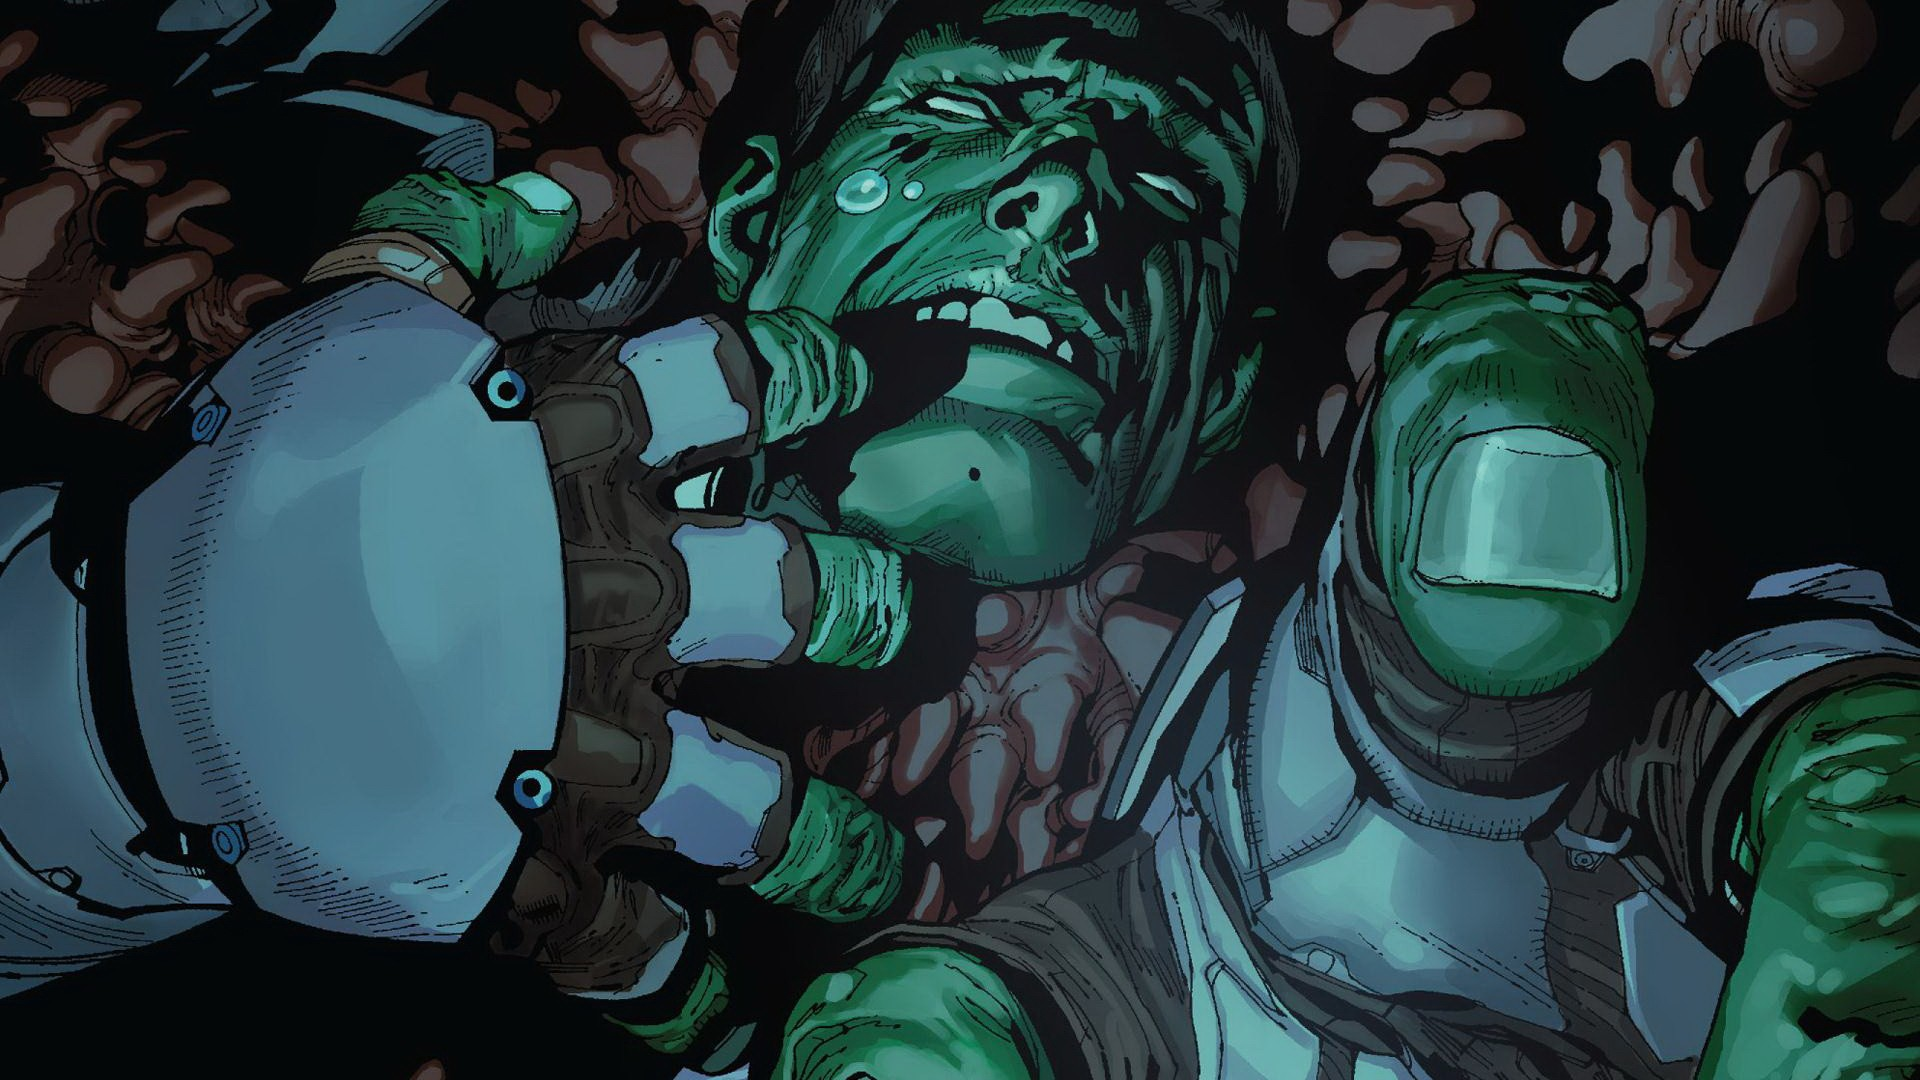 Hulk fonds d 39 cran arri res plan 1920x1080 id 398912 - Telecharger hulk ...